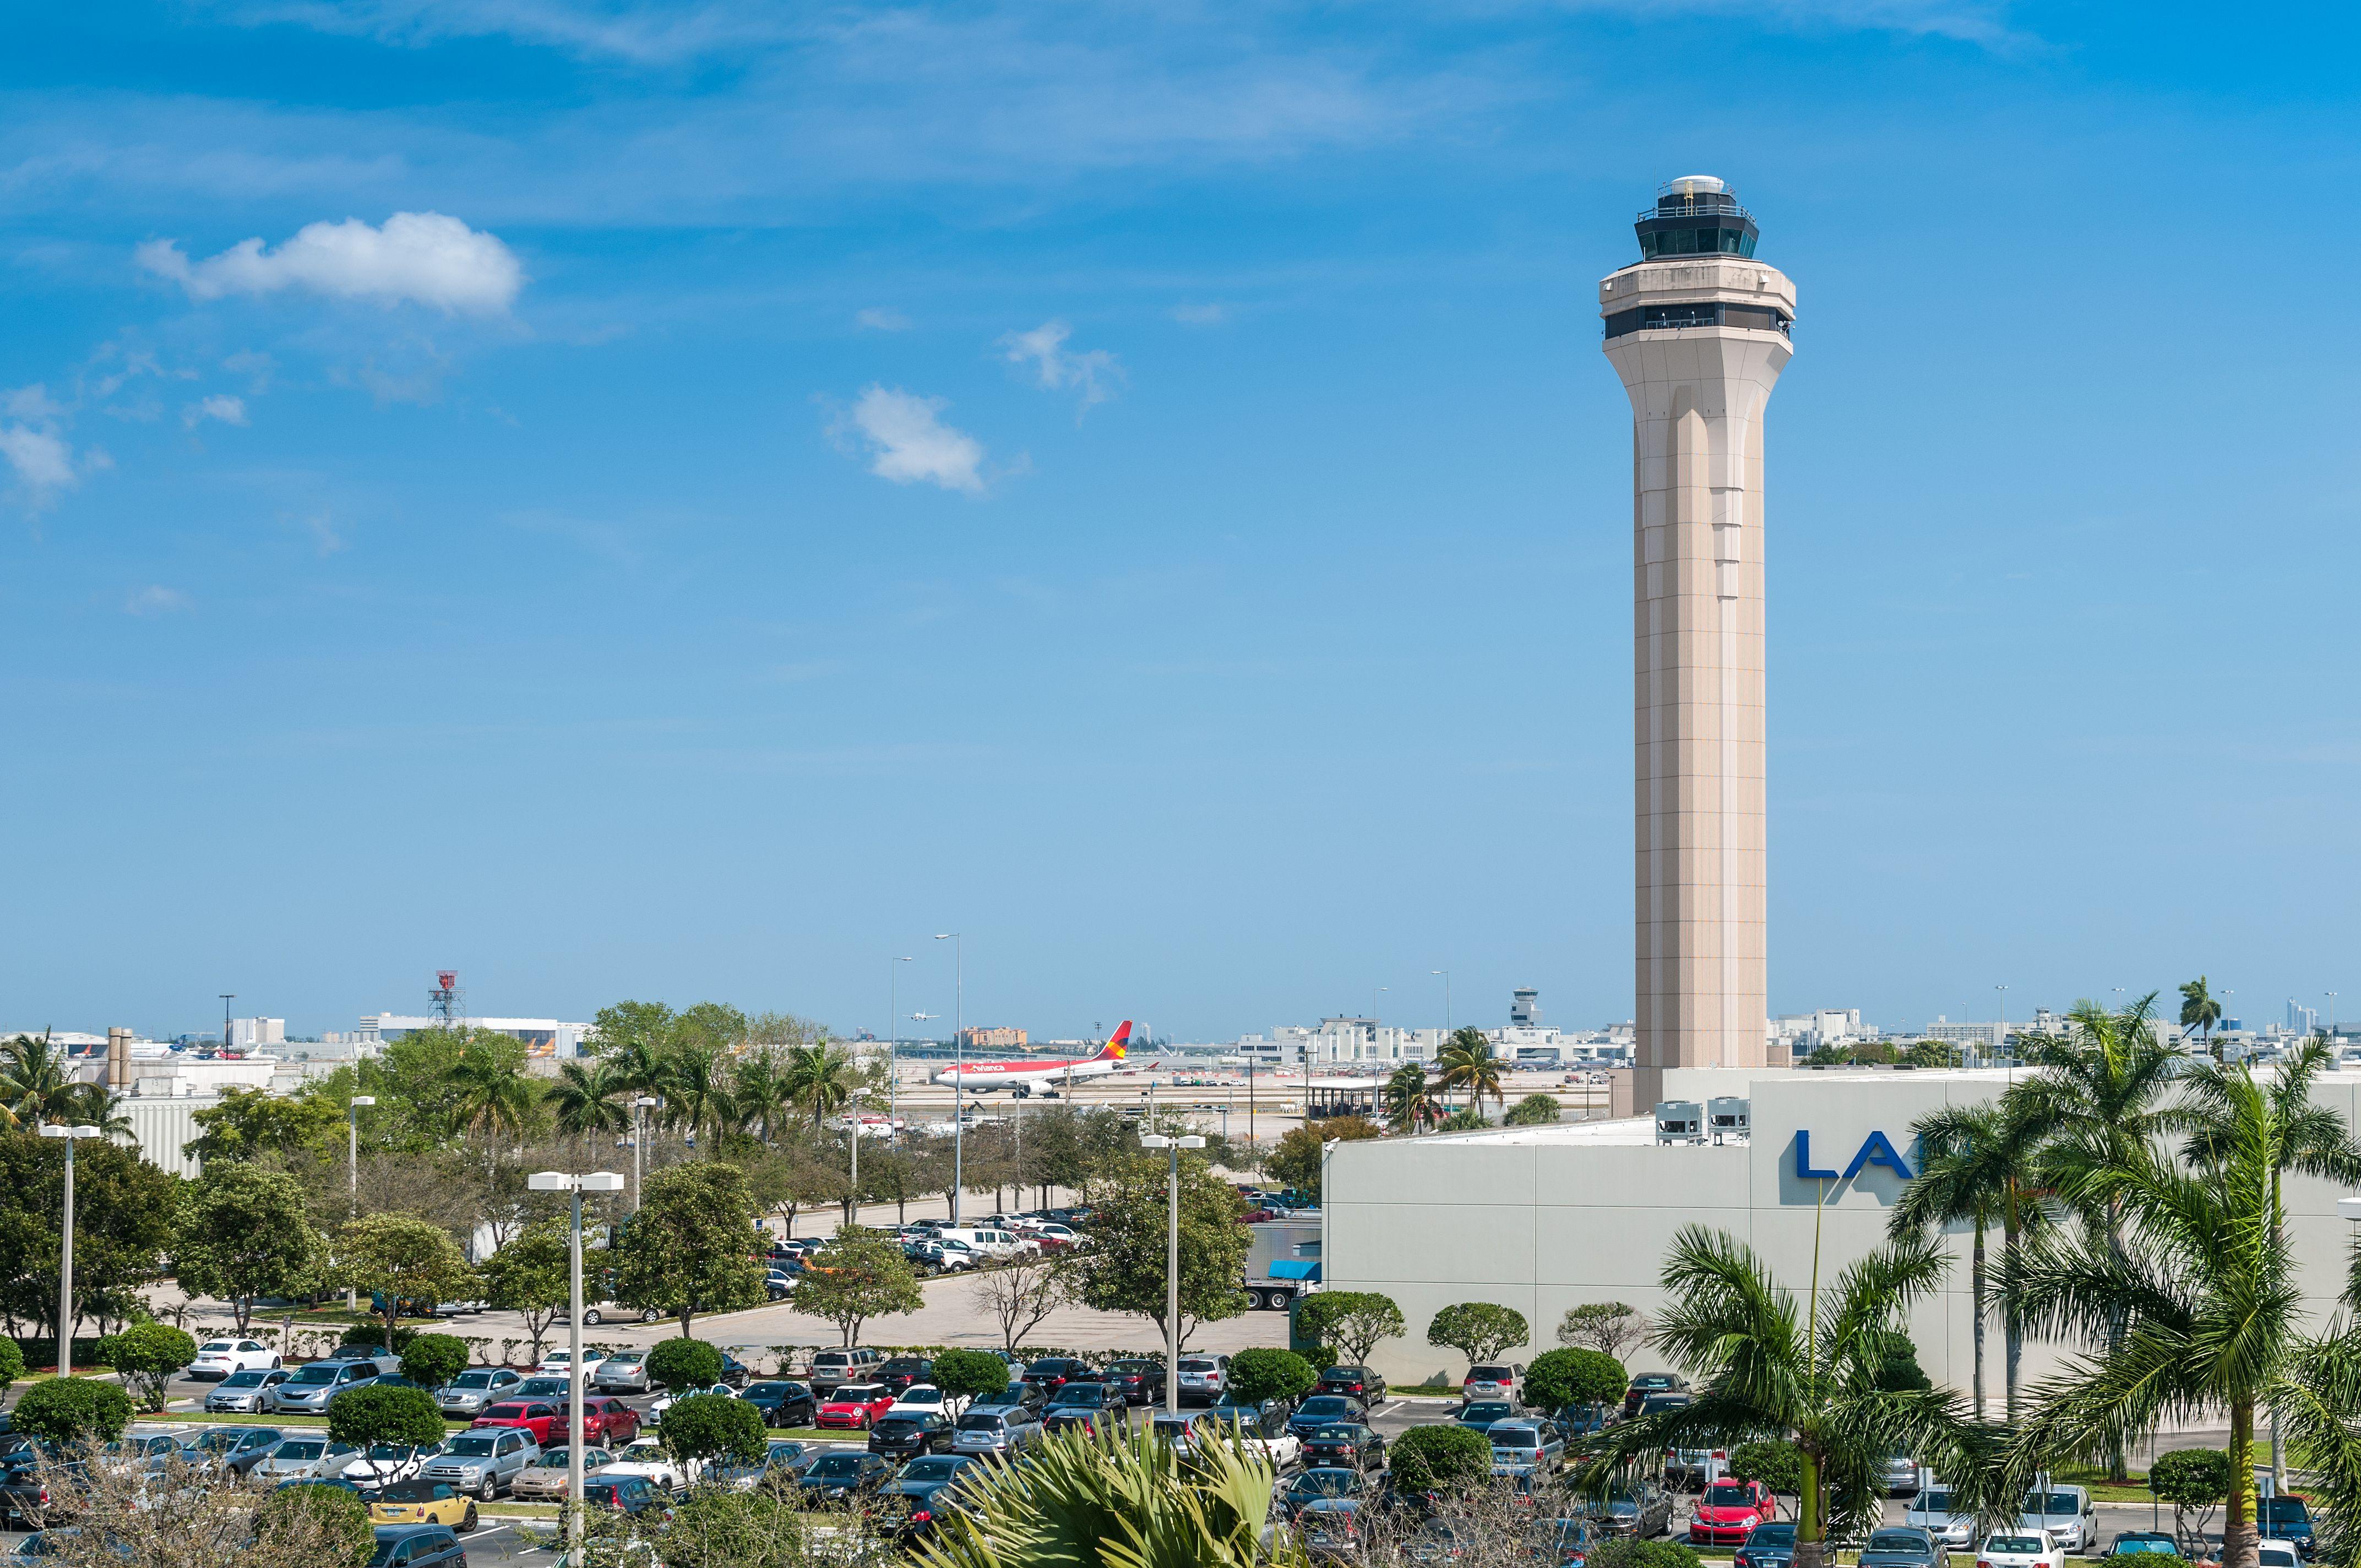 Miami International Airport Outside